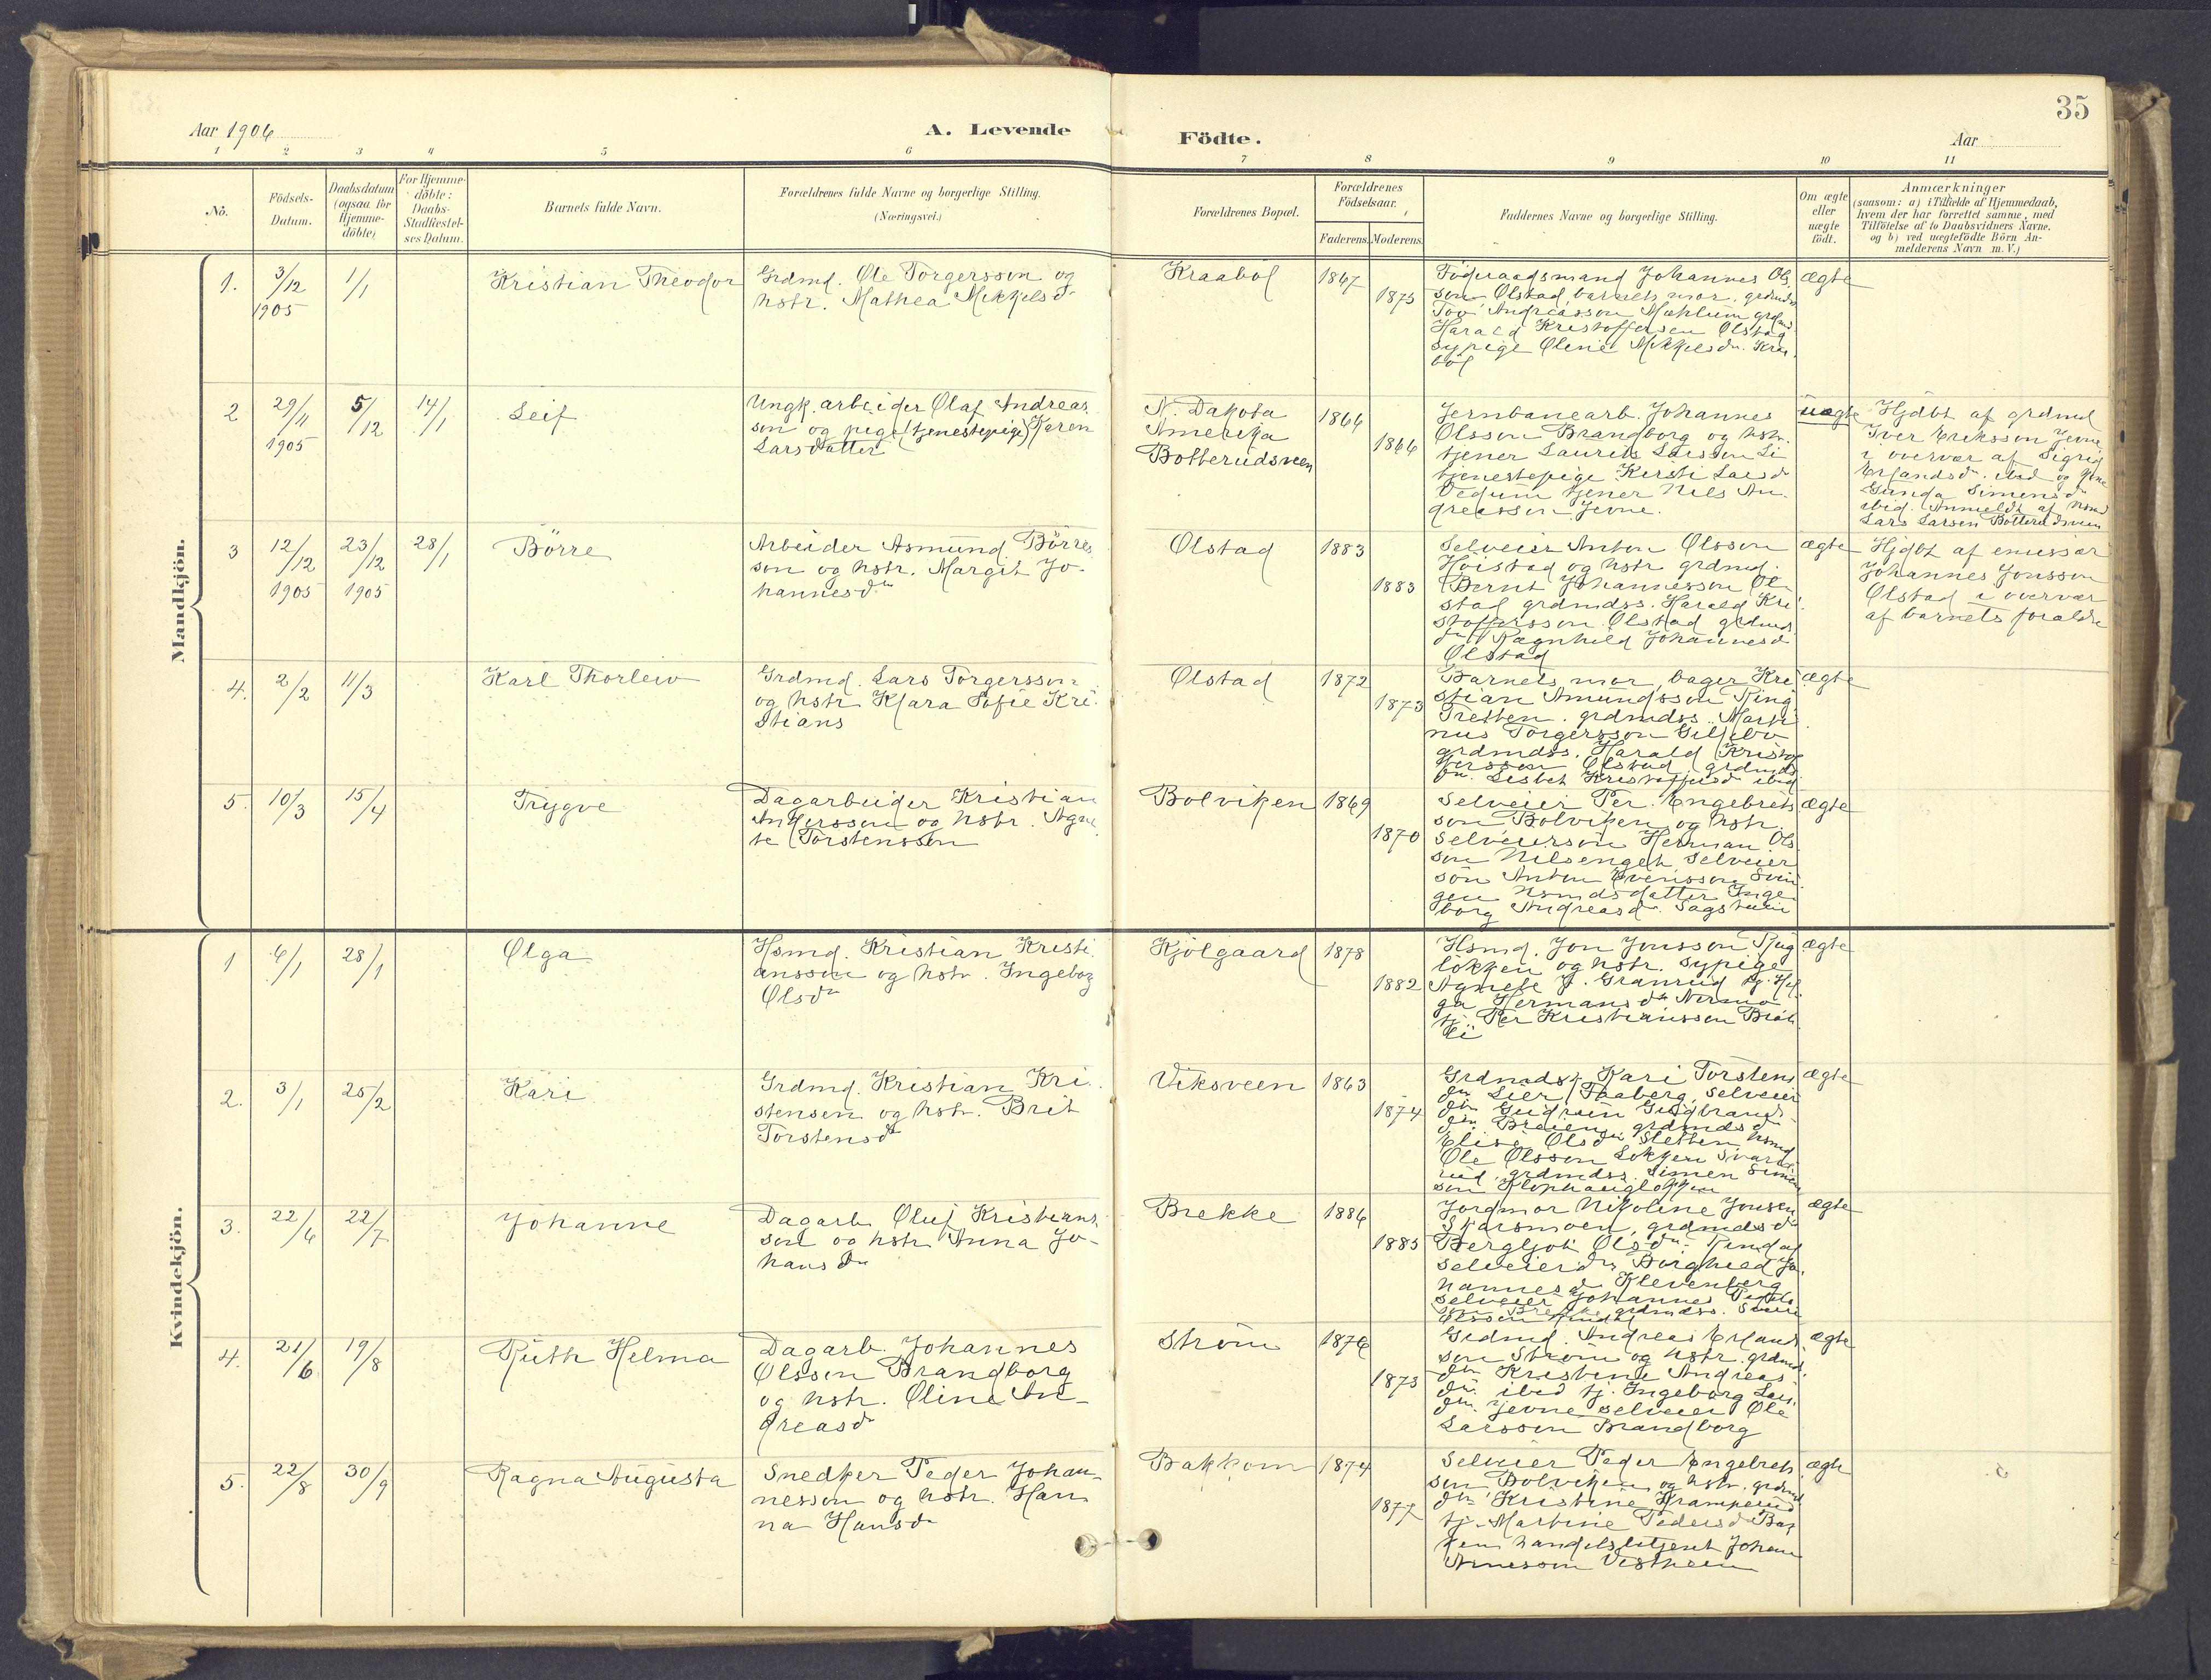 SAH, Øyer prestekontor, Ministerialbok nr. 12, 1897-1920, s. 35